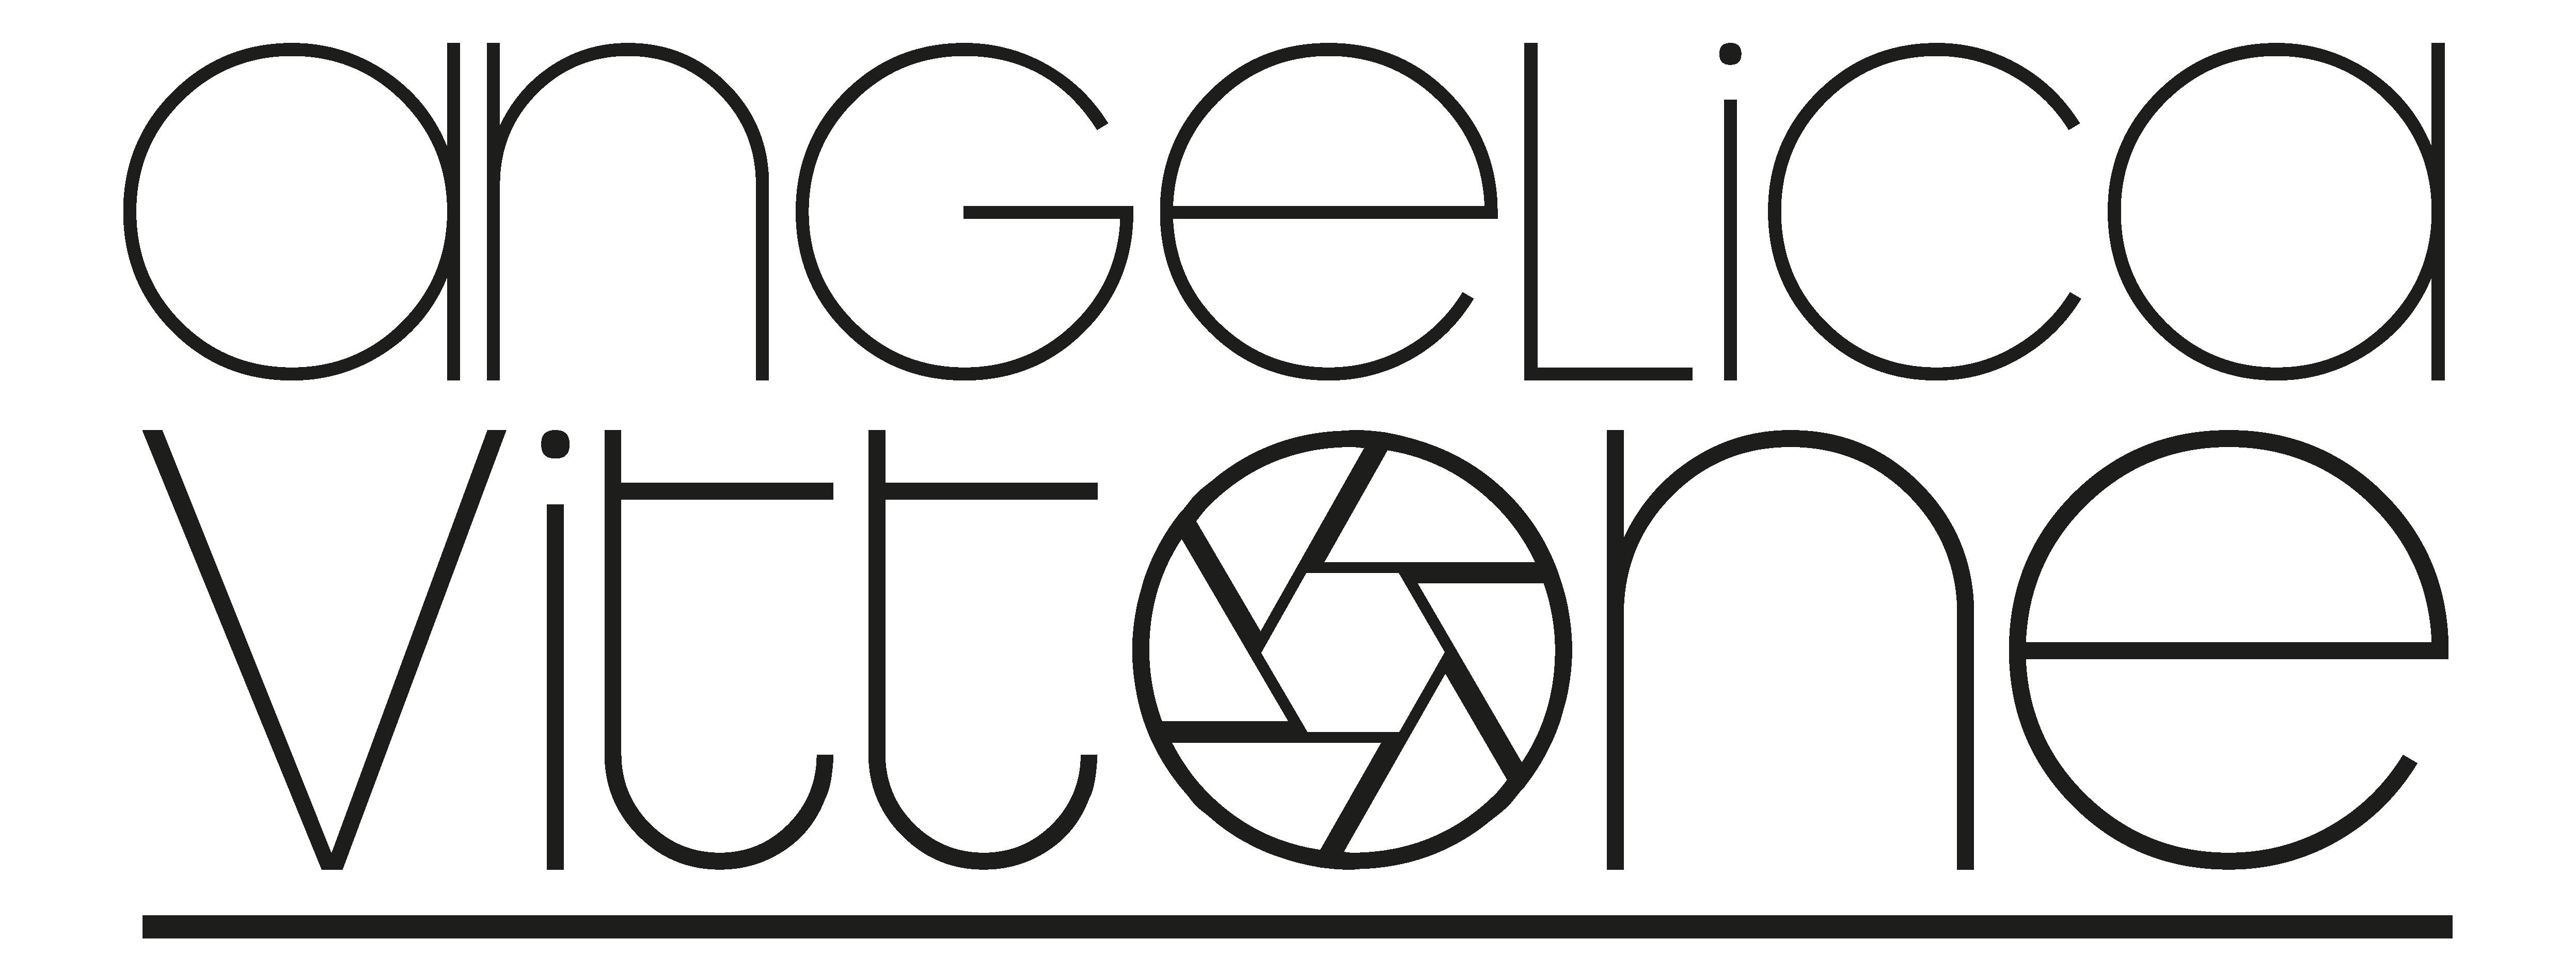 Angelica Vittone